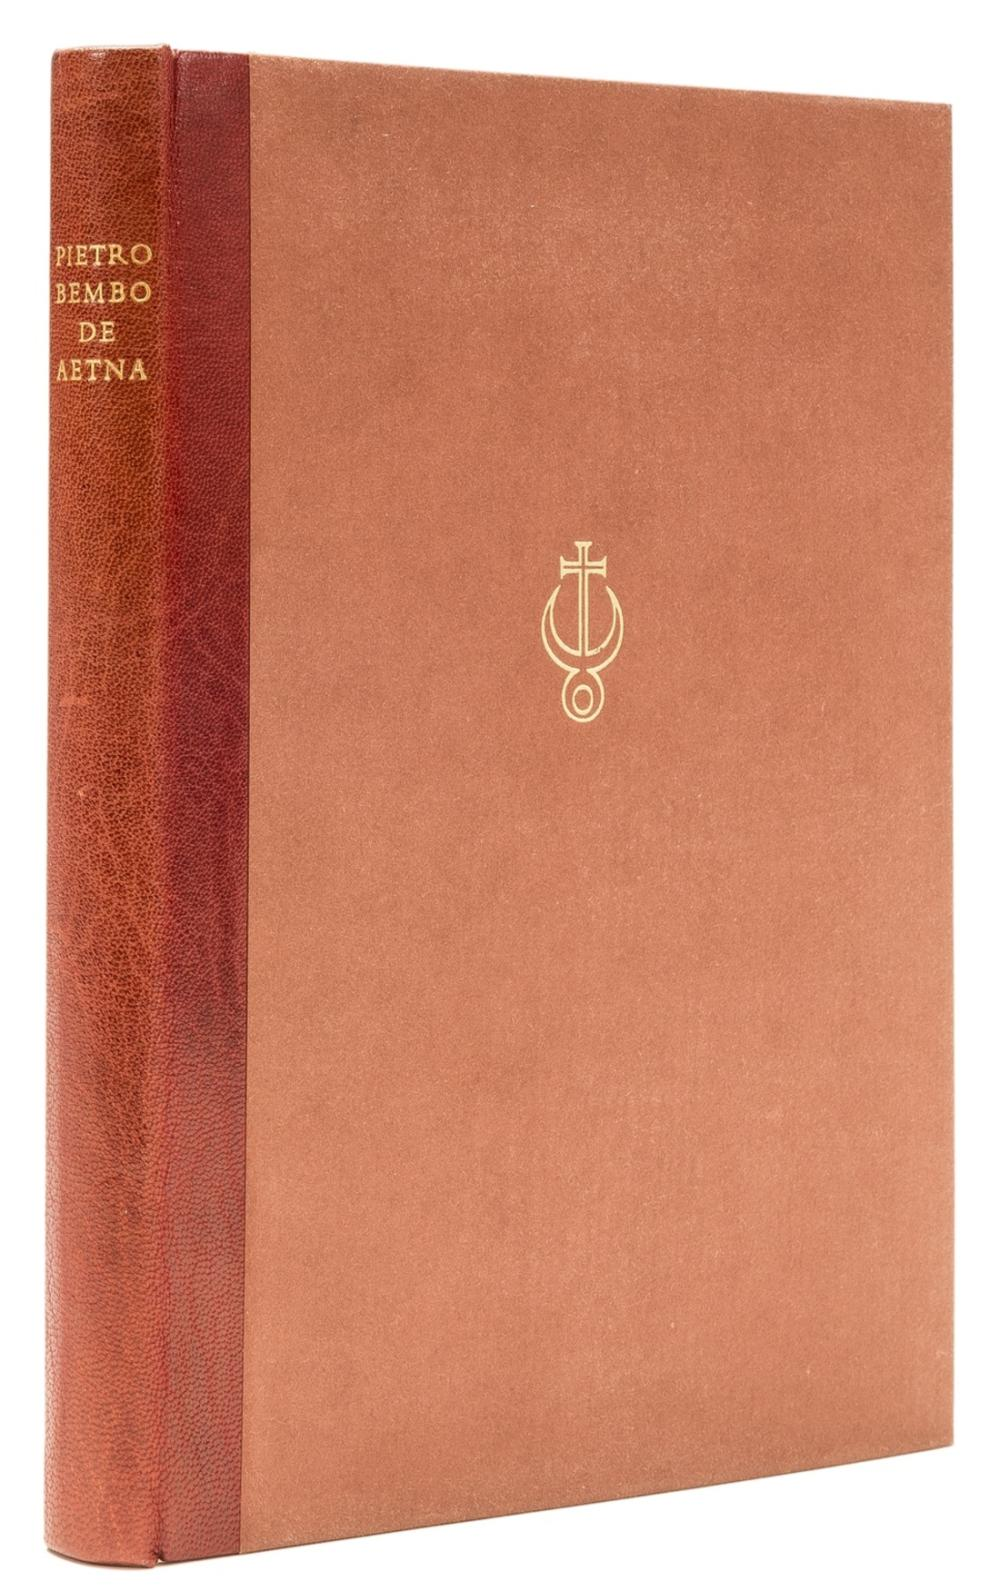 Officina Bodoni.- Bembo (Pietro) De Aetna Liber; On Etna, one of 125 copies, Verona, 1969.